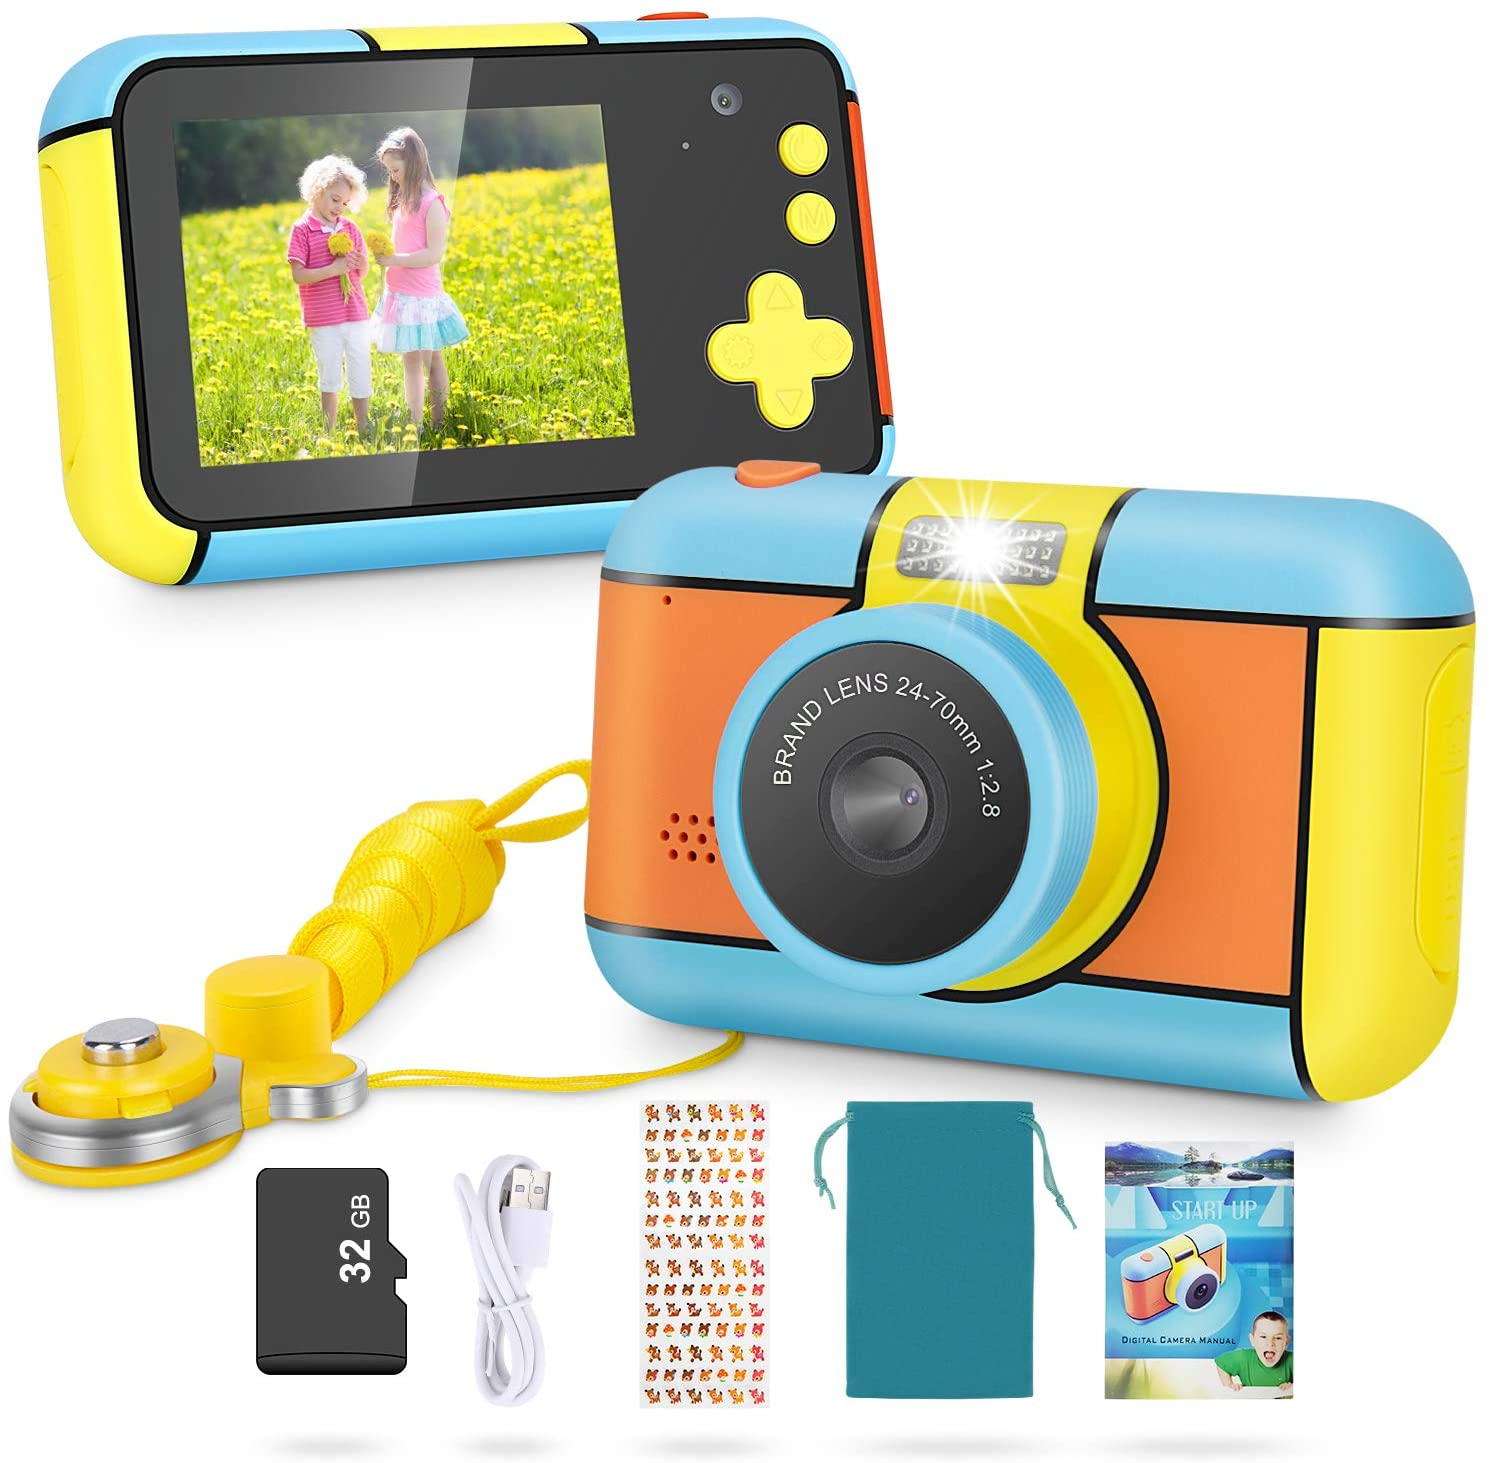 February 2021 VIP Kids Prize: Magicfun Digital Camera for Kids